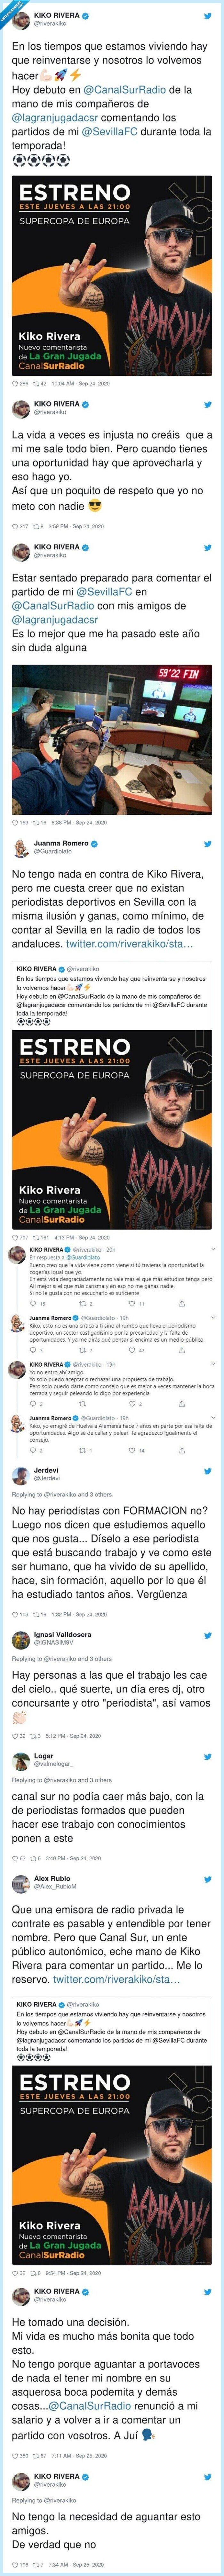 críticas,deportivo,dimisión,kiko,lío,periodista,rivera,twitter